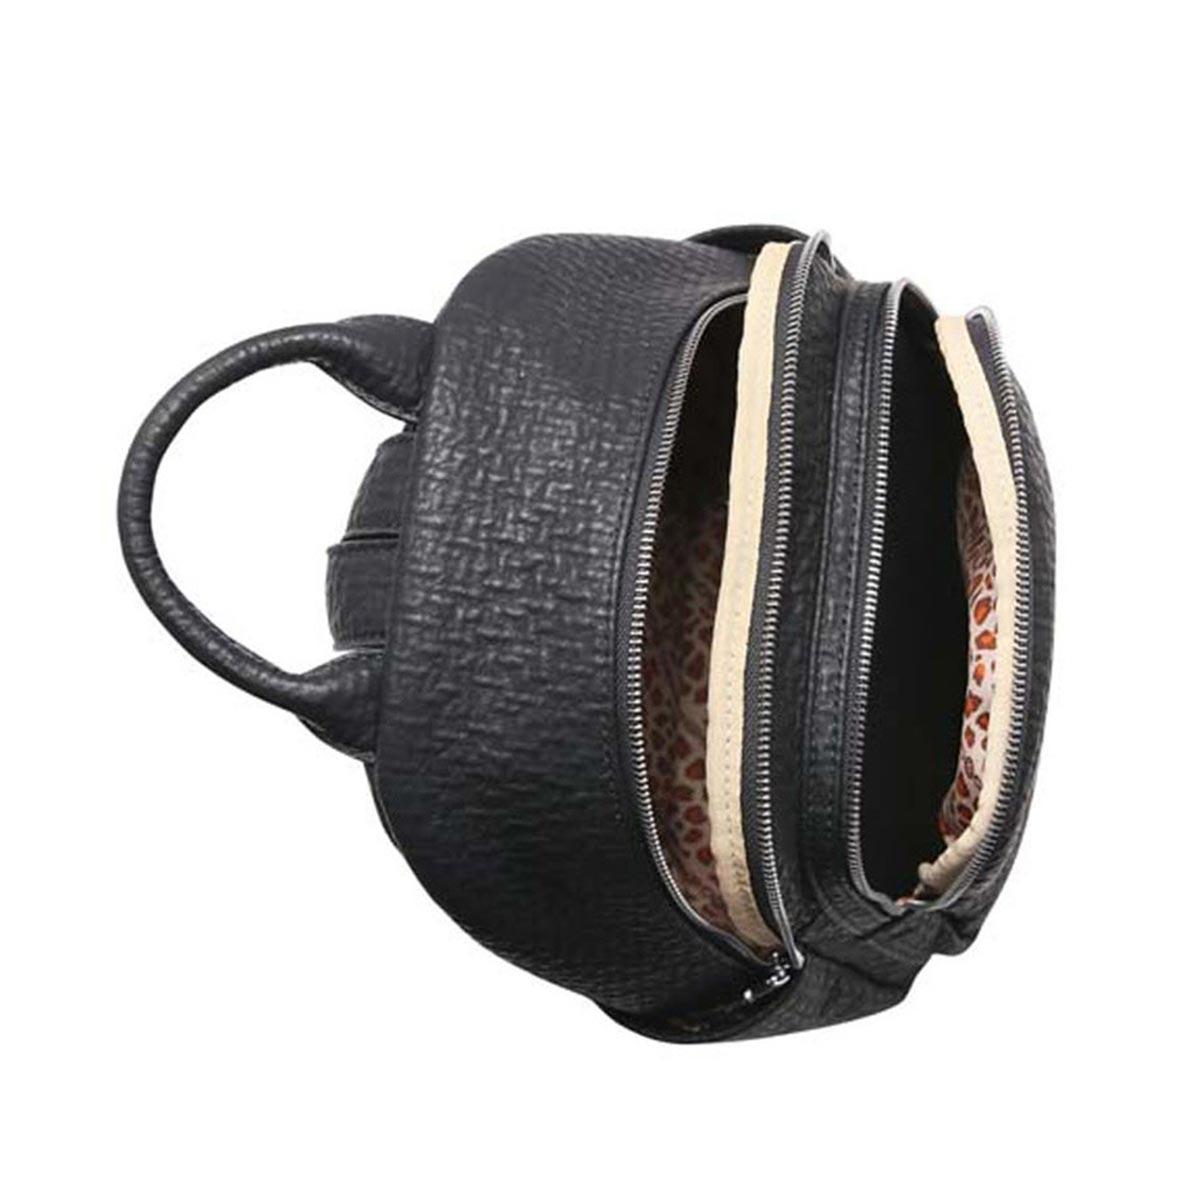 Bolsa Mochila Pequena Feminina Chenson Streetwear Original